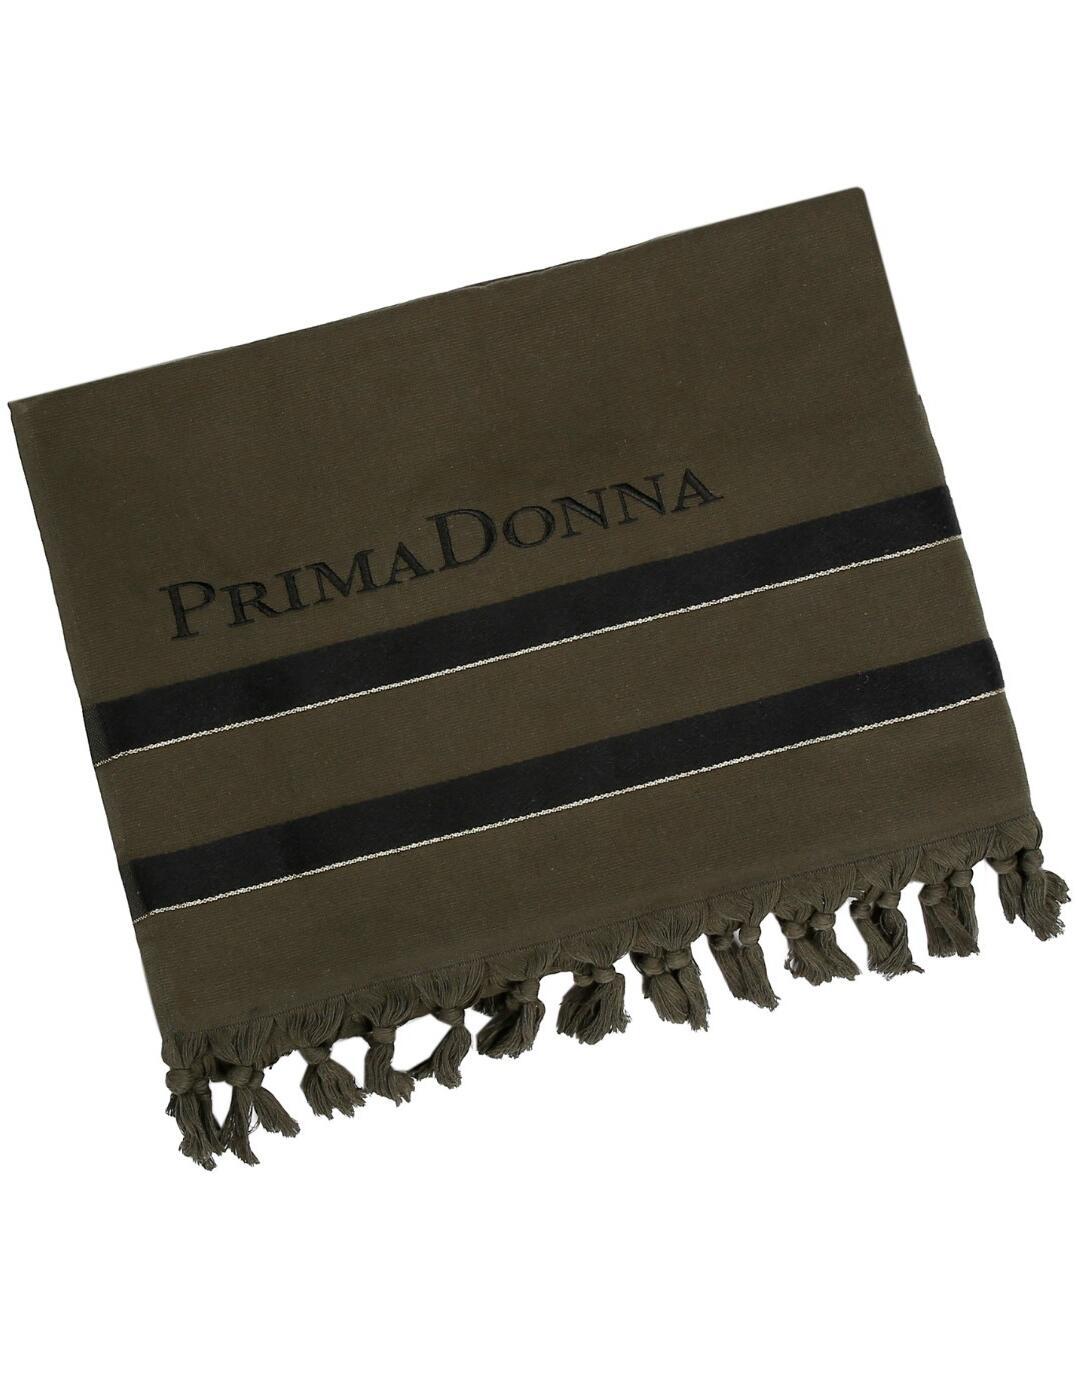 4006098 Prima Donna Swim Santa Barbara Beach Towel Accessory - 4006098 Kaki